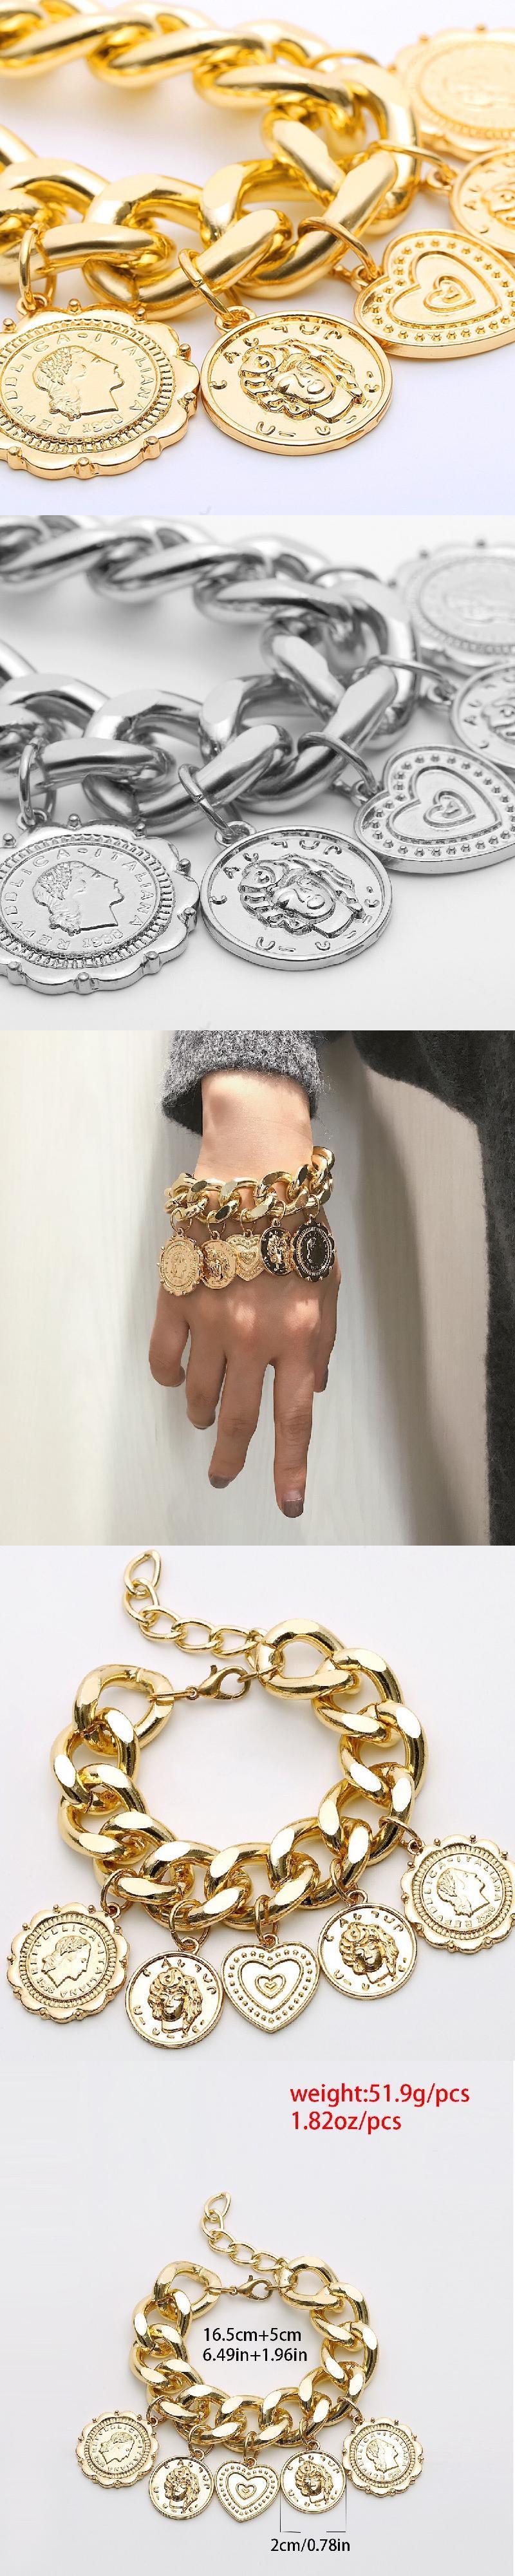 gold coin bracelet Wedding birthday christmas costume beach party decorations  alloy metal charm pendant bracelet jewelry set